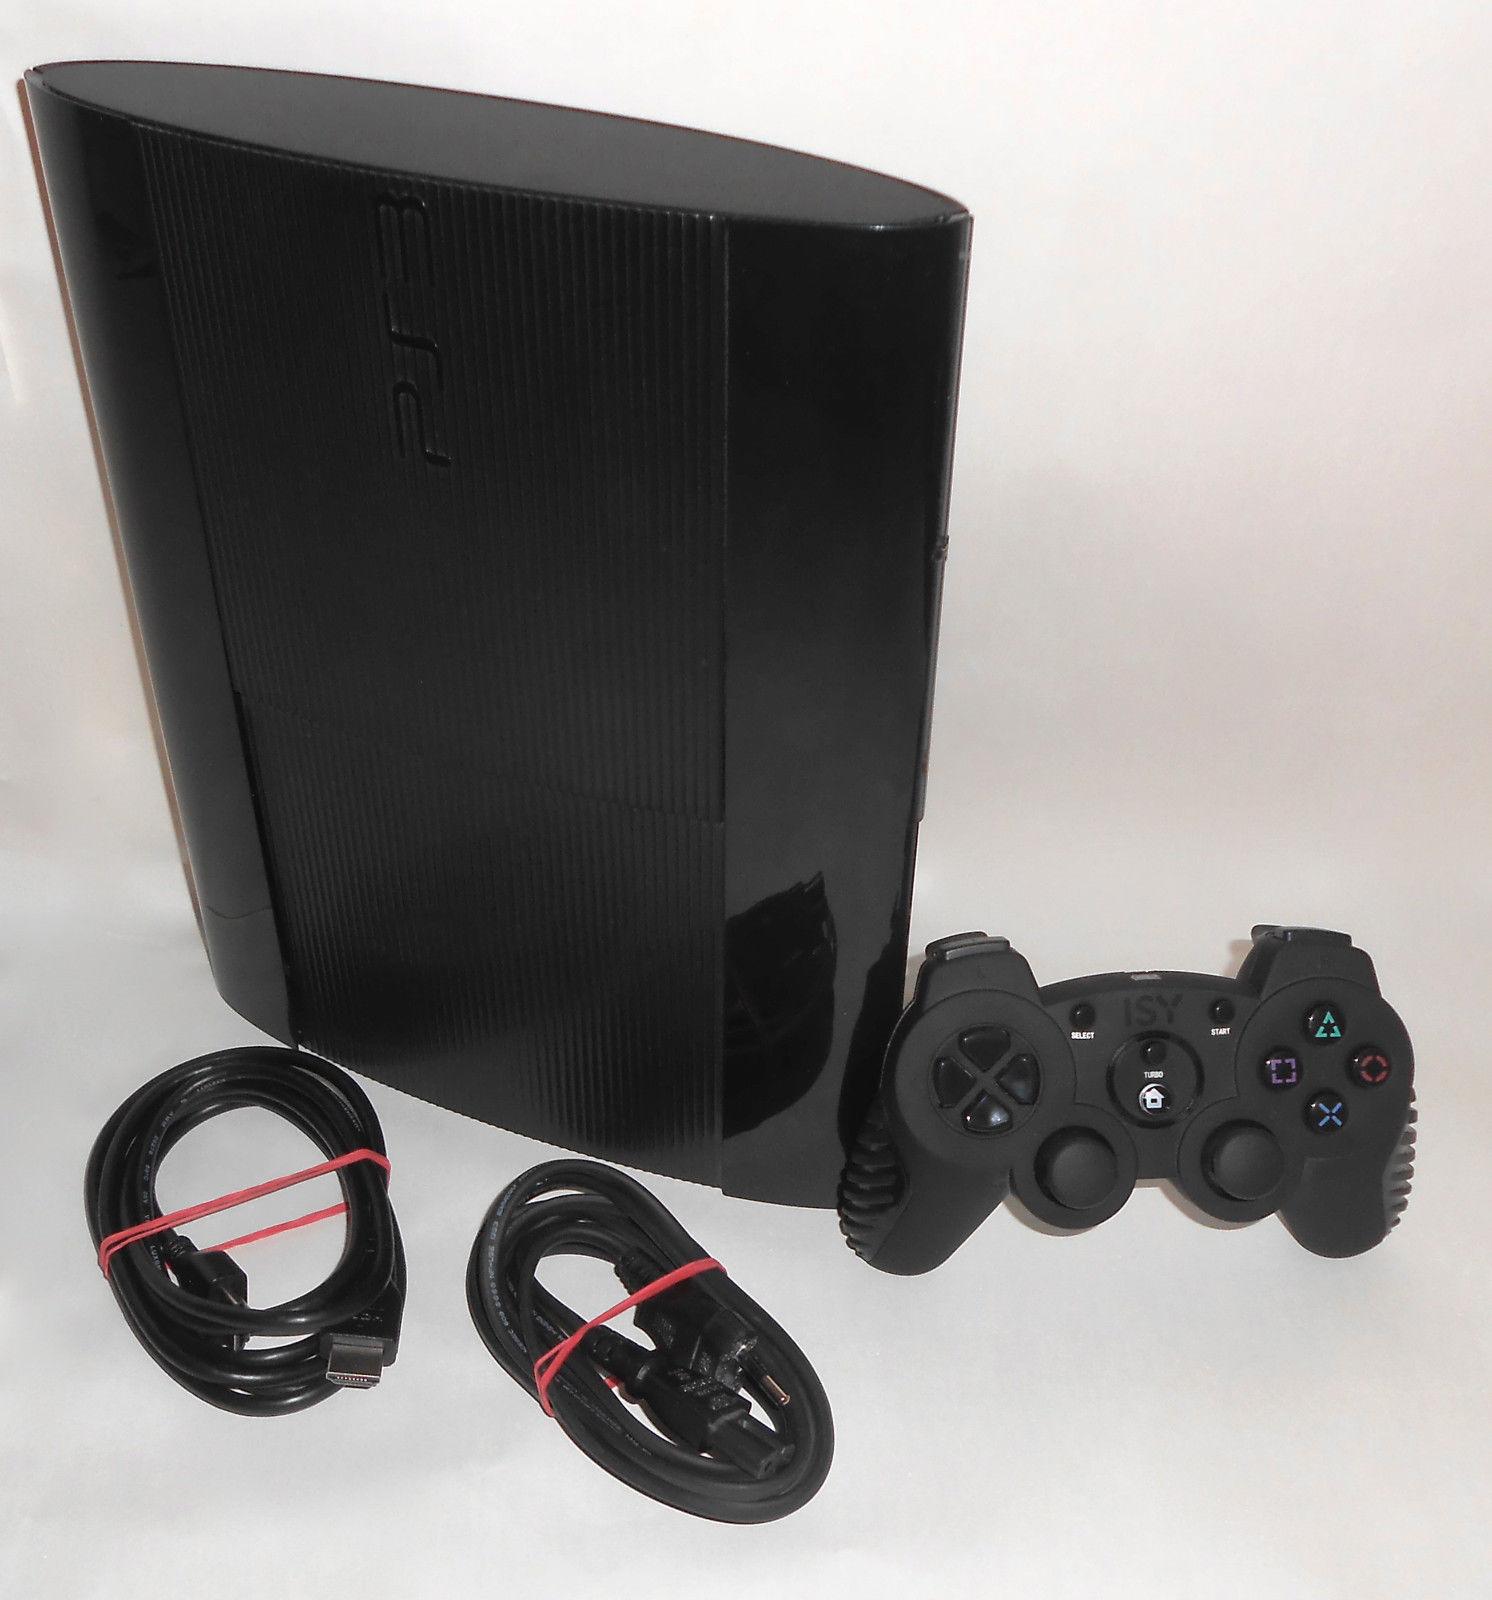 Sony Playstation 3 PS3 Super Slim Konsole 500 GB Spielkonsole + Controller